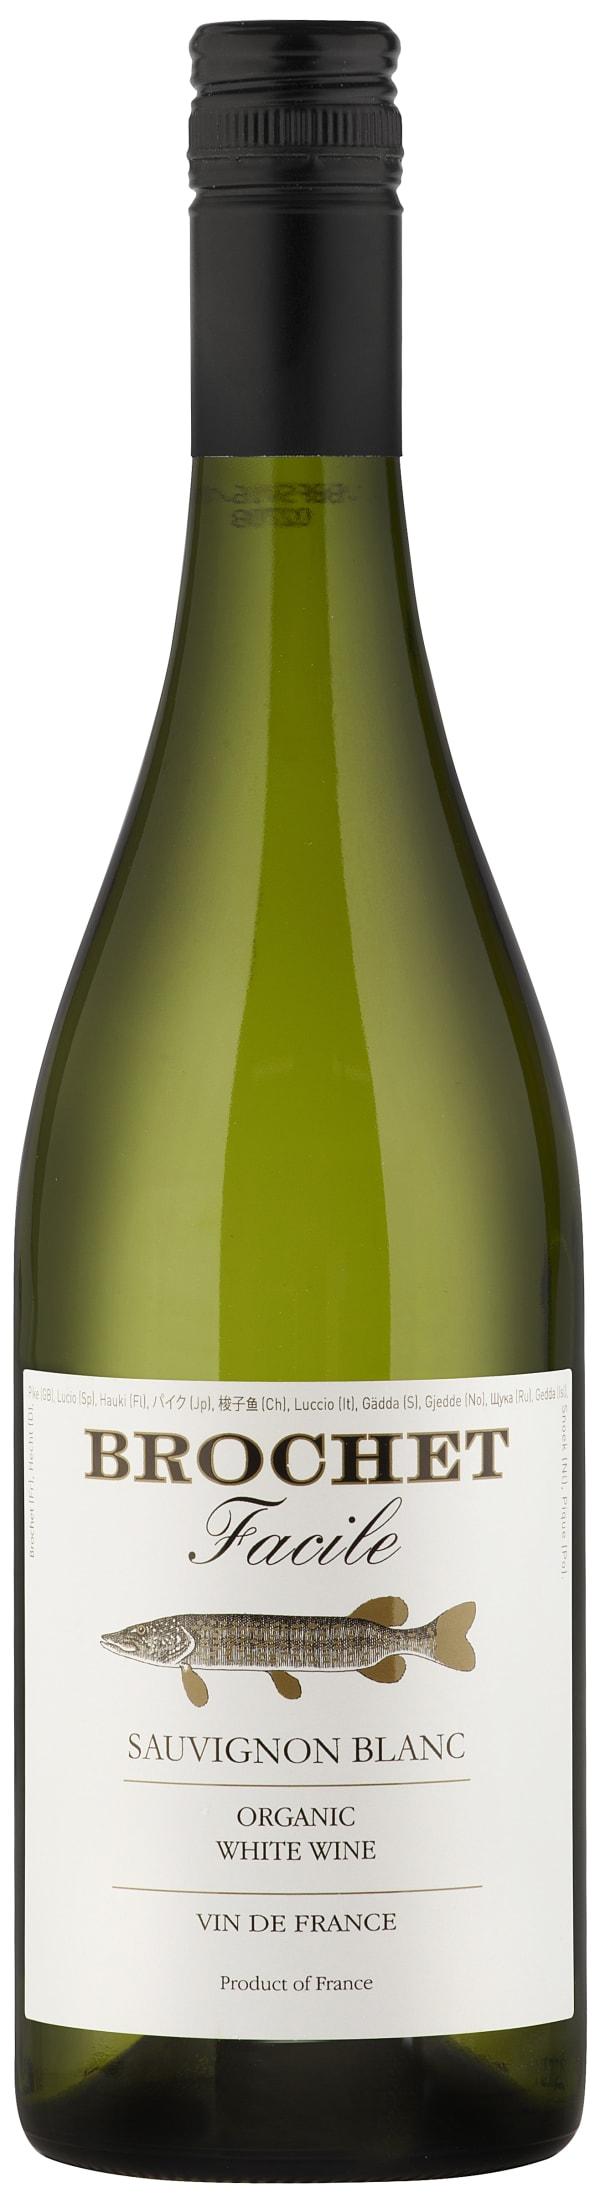 Brochet Organic Sauvignon Blanc 2016